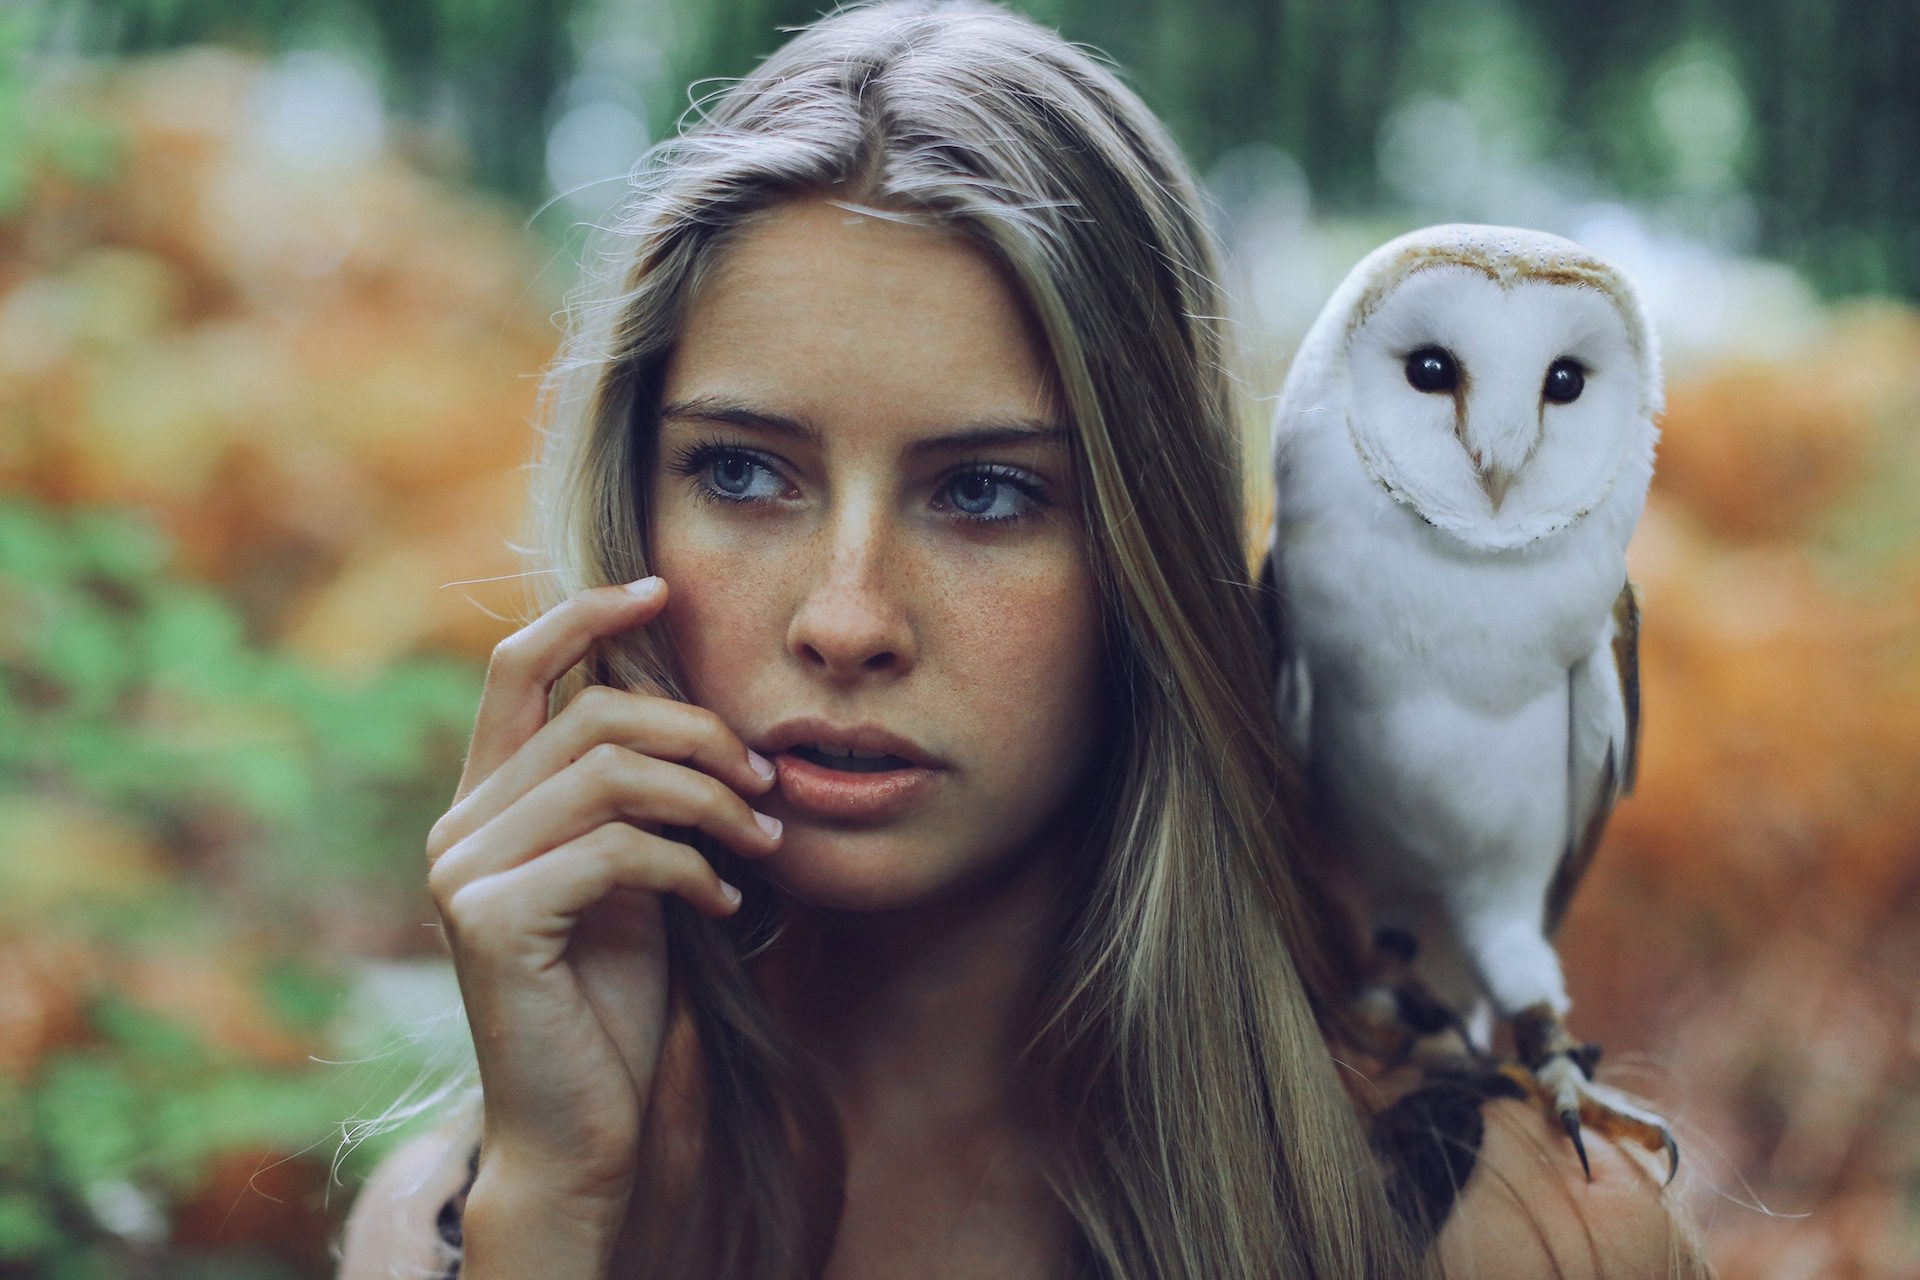 mulher, CORUJA, Pássaro, Animal de estimação, Olha - Papéis de parede HD - Professor-falken.com